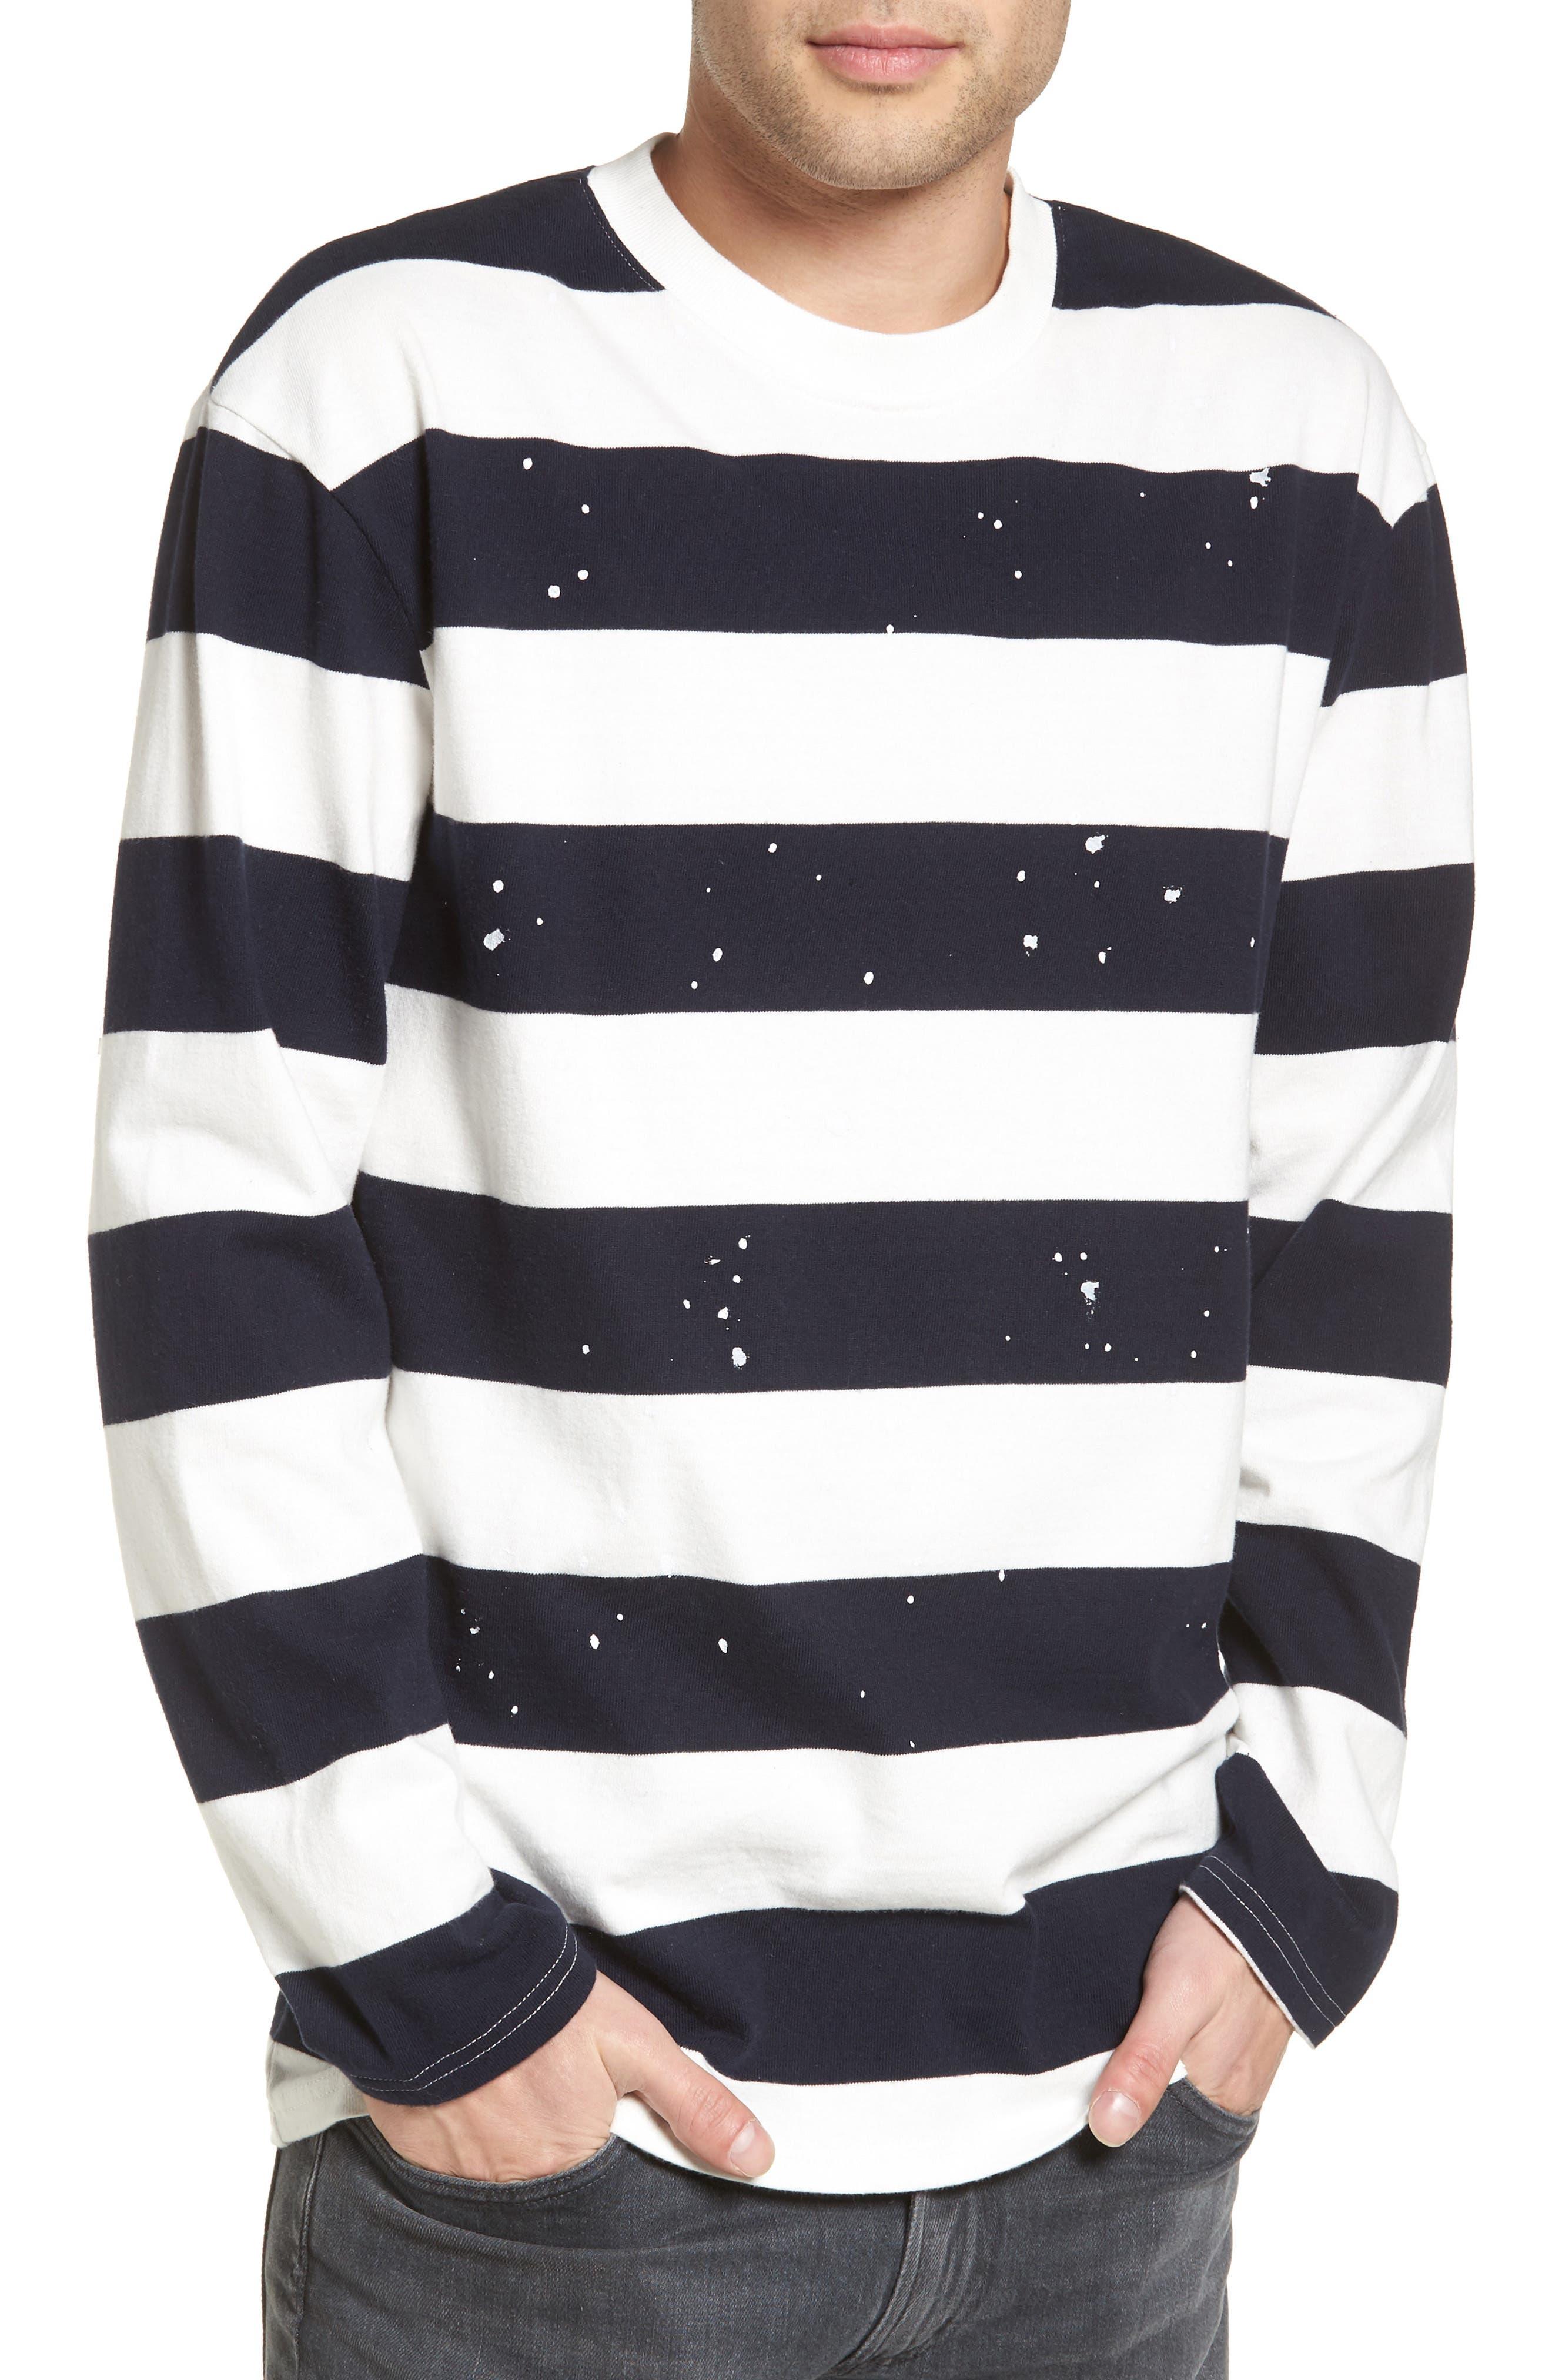 Paint Splatter Sweatshirt,                         Main,                         color, Navy Peacoat White Stripe